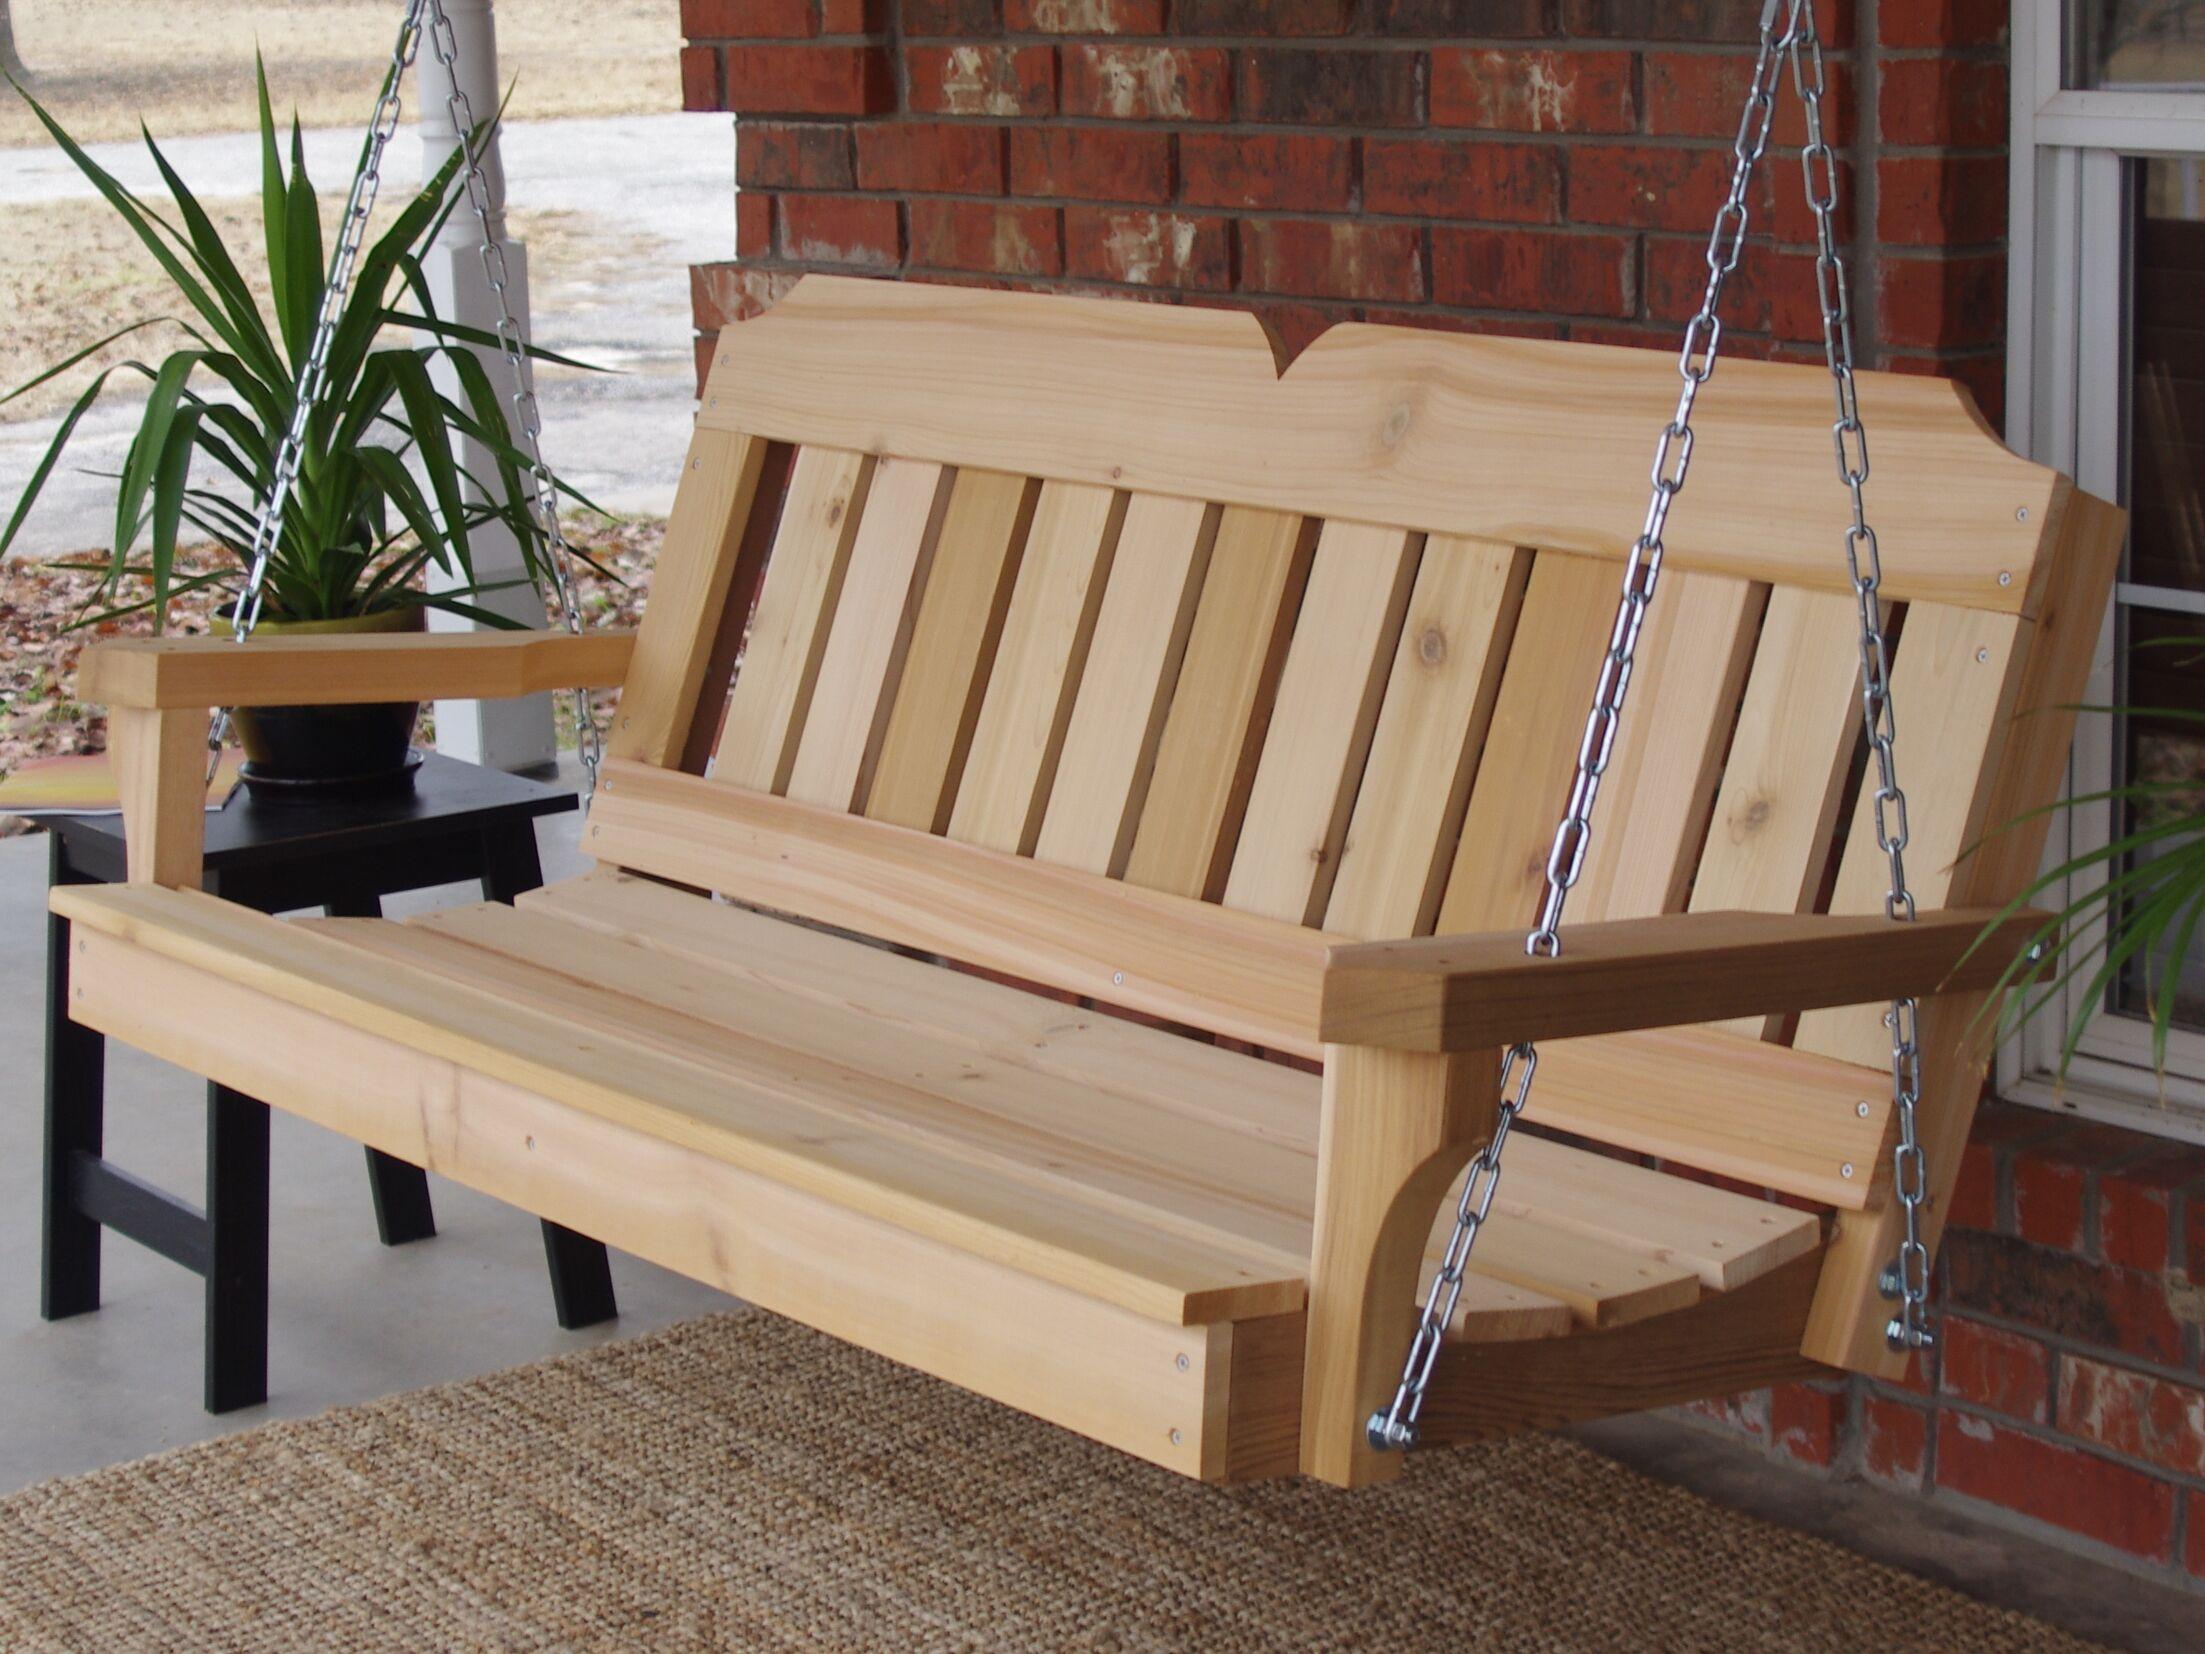 Galusha Cedar Porch Swing Finish: Stained/Regular, Size: 24